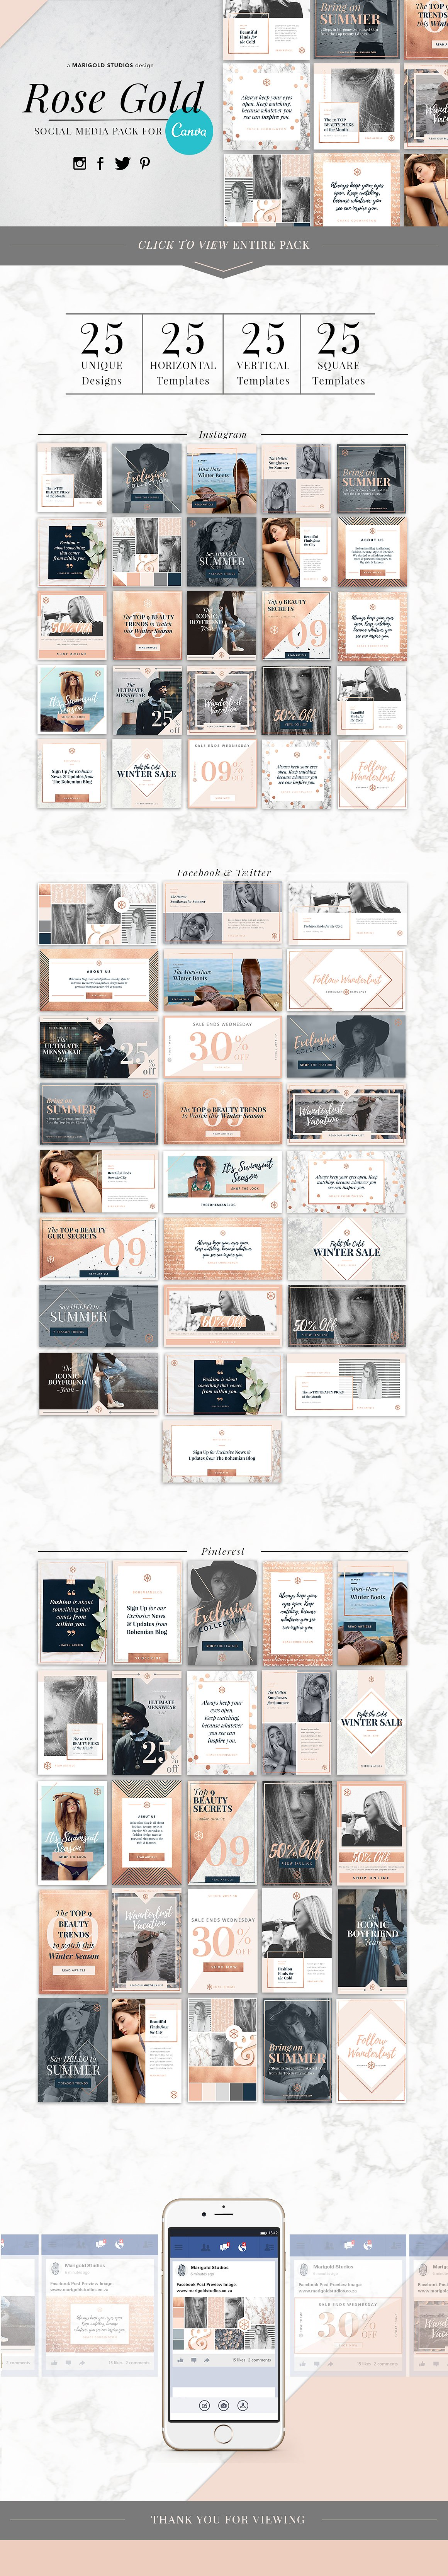 Social Media Template Canva Rose Gold for Pinterest, Instagram, Facebook, Blog.